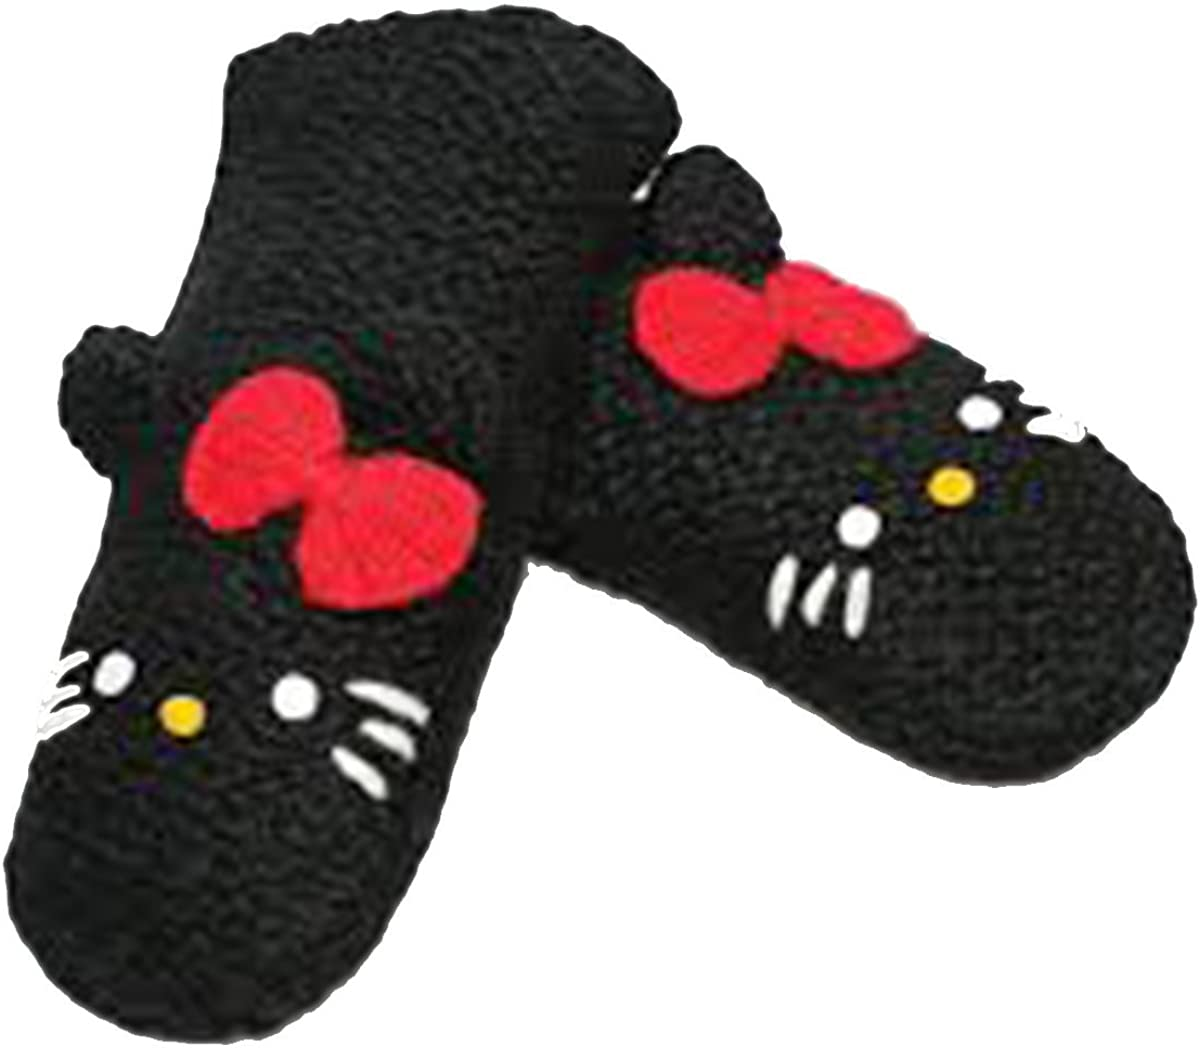 Delux Knitwits Kids Hello Kitty Mittens Black